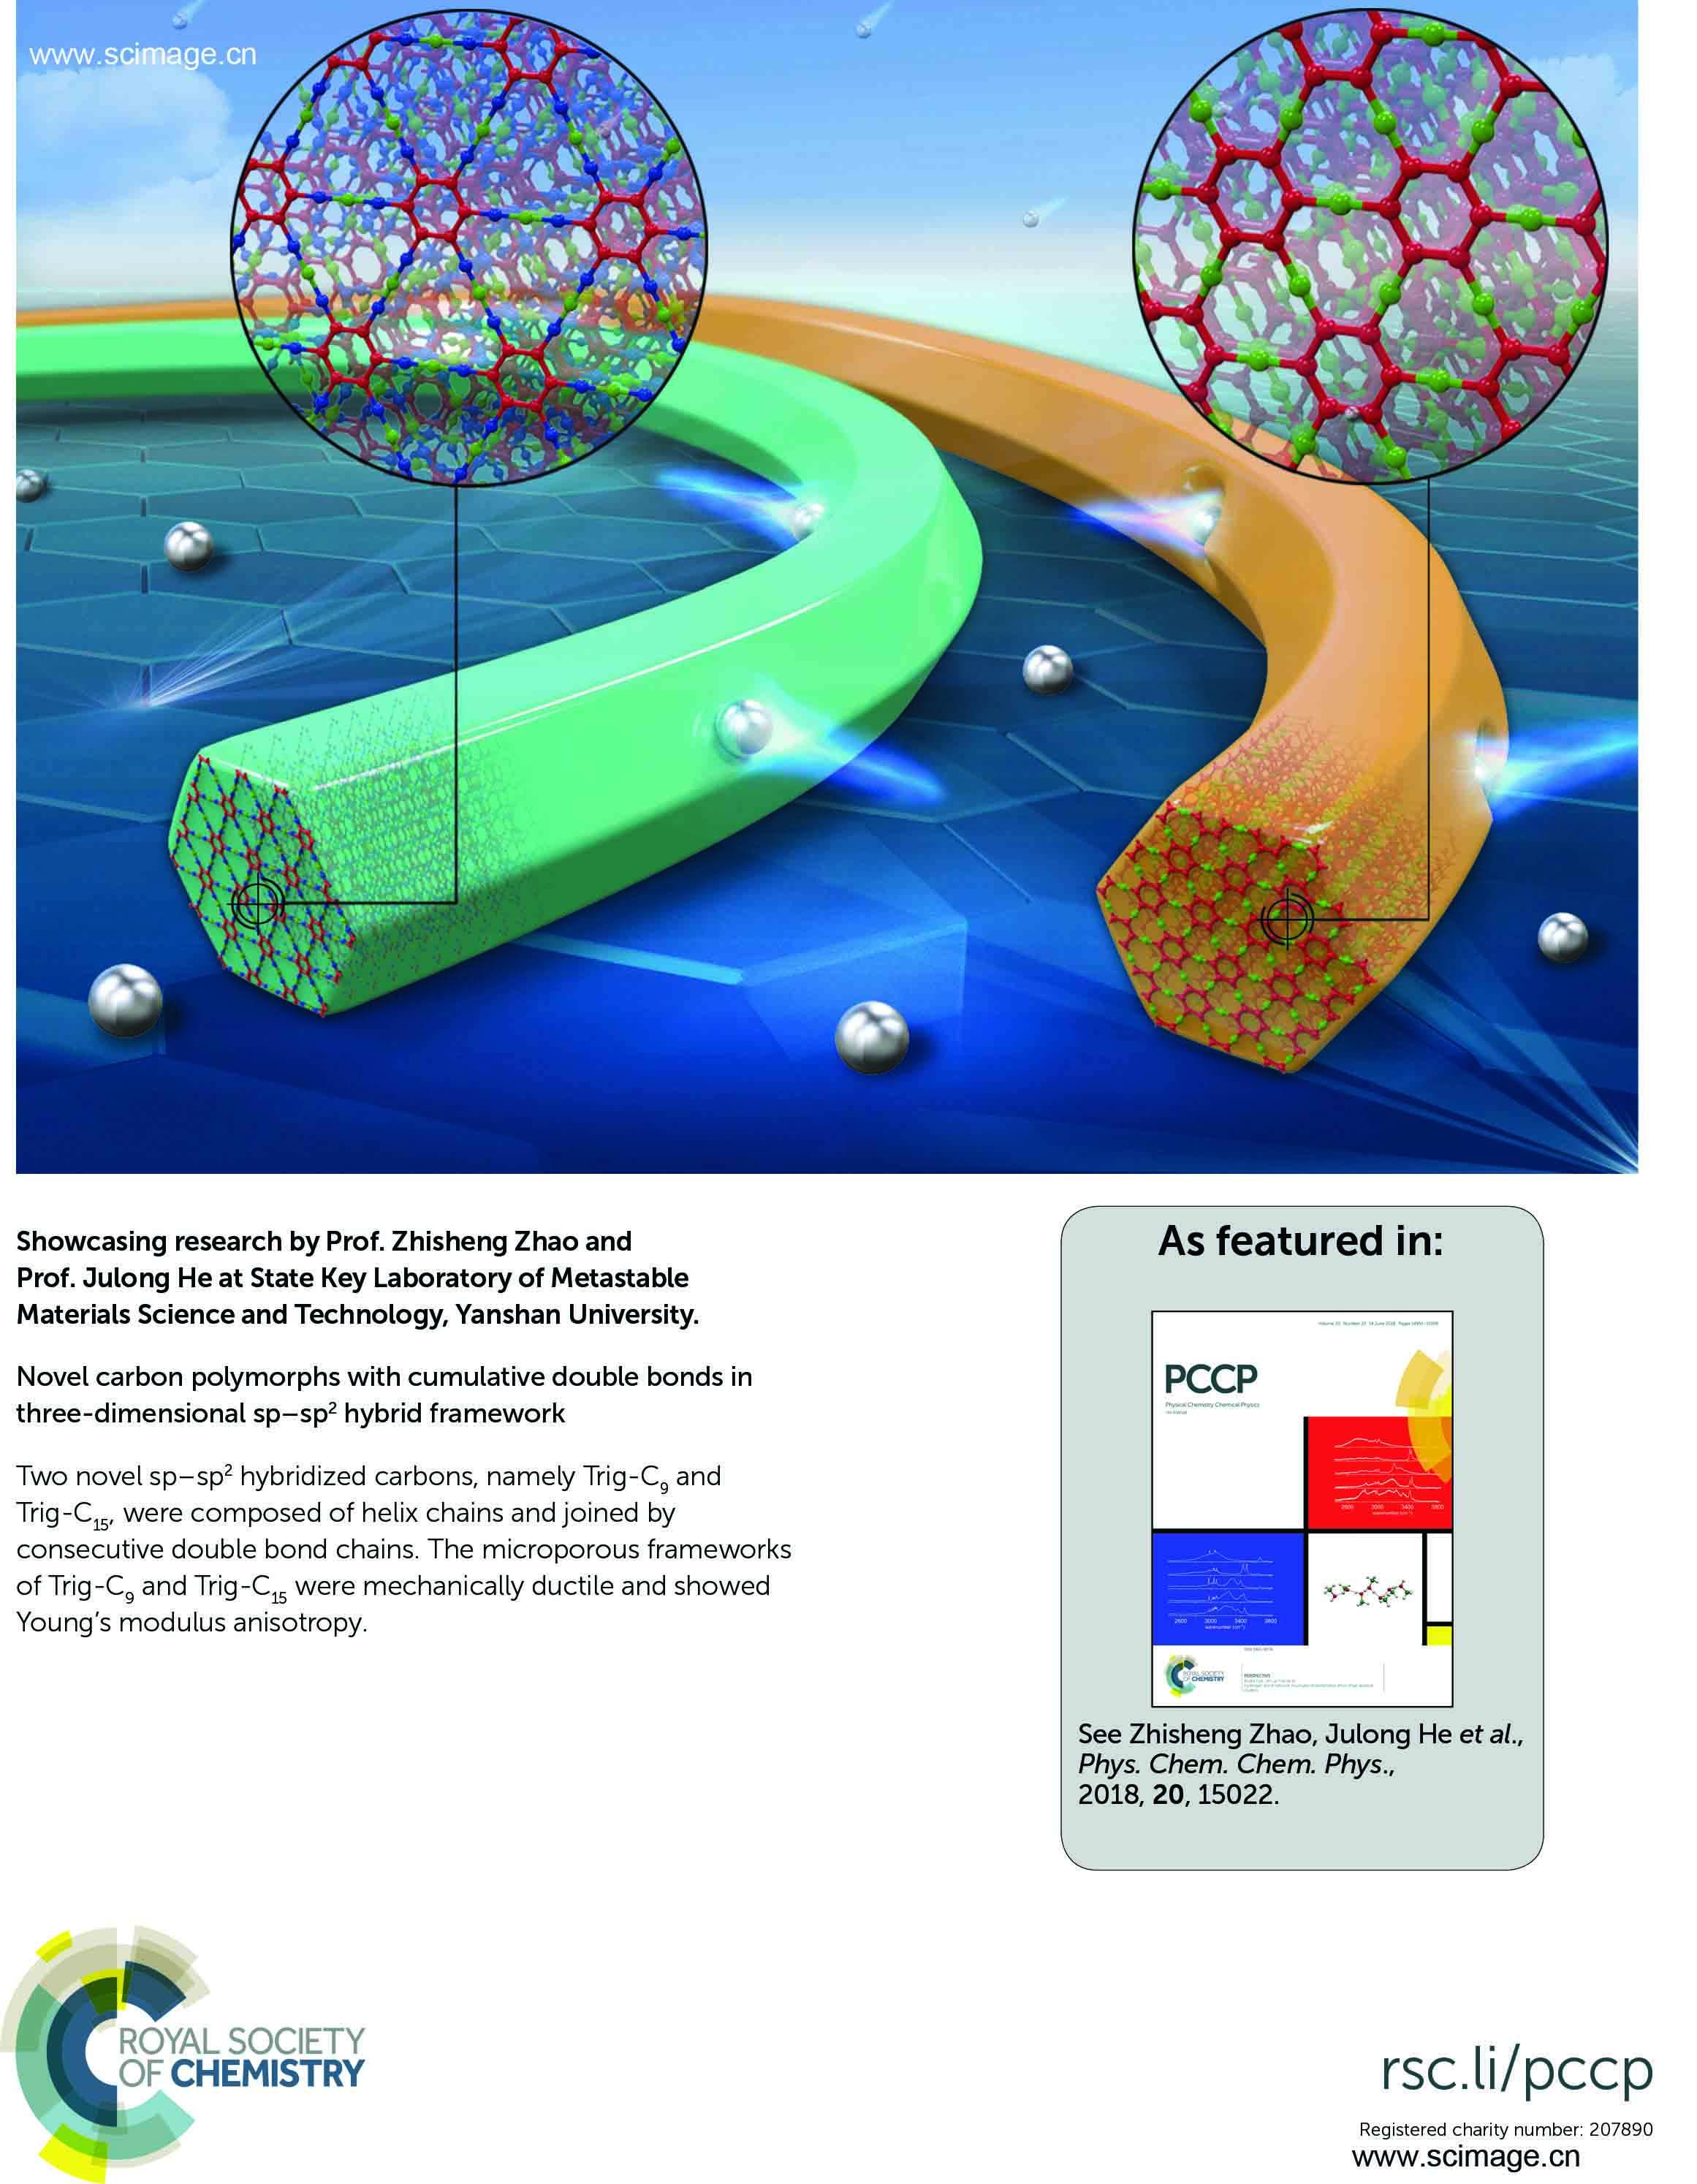 Novel carbon polymorphs with cumulative double bonds in three-dimensional sp–sp2 hybrid framework